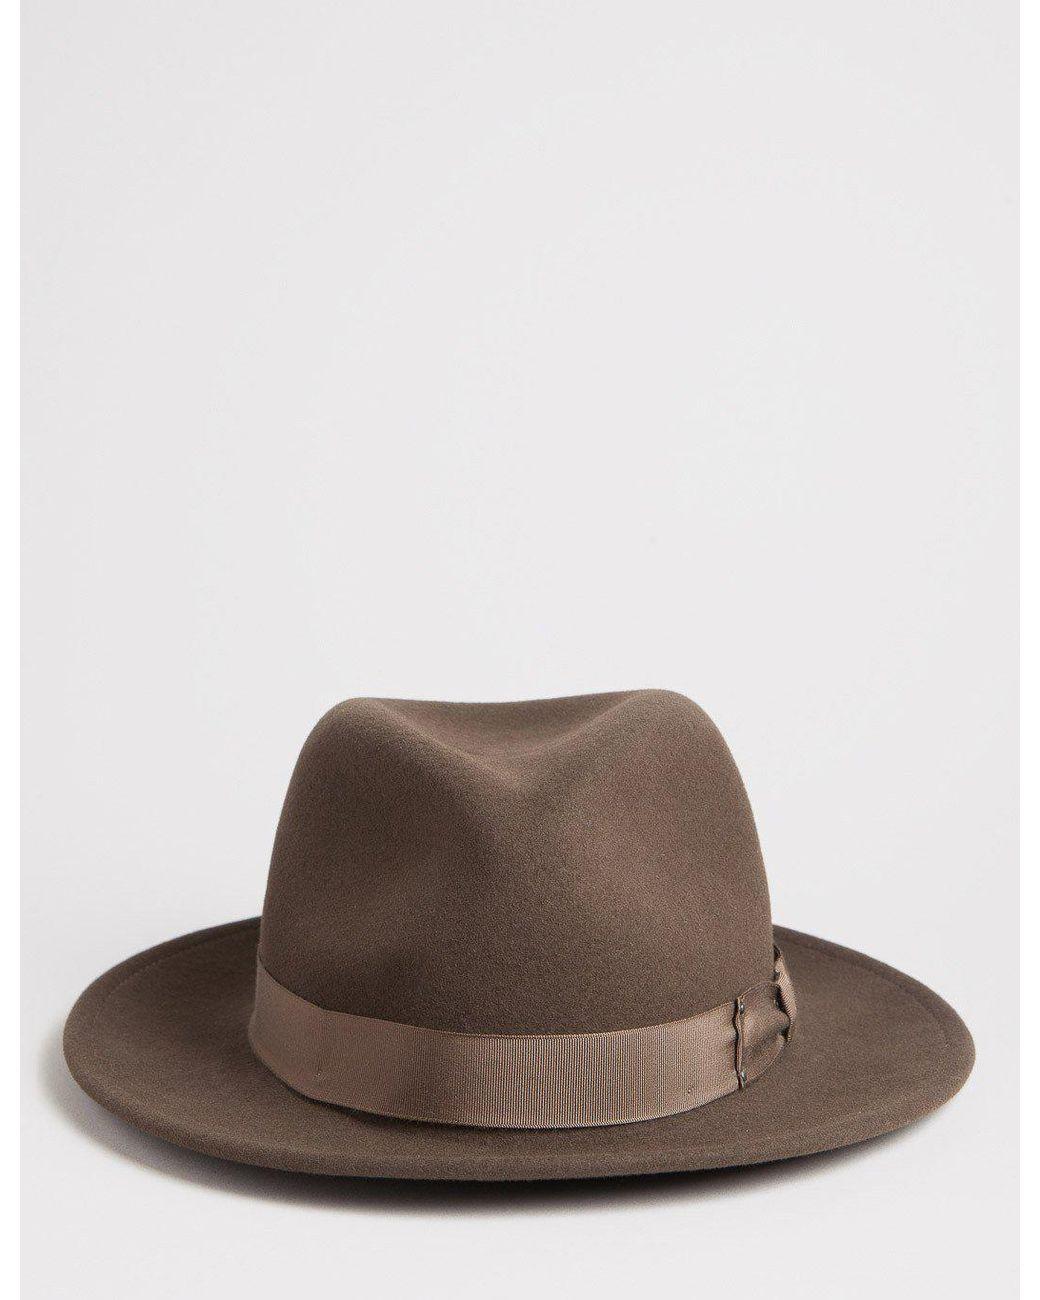 492de9425da913 Bailey of Hollywood Bailey Curtis Widebrim Fedora Hat in Brown for Men -  Lyst